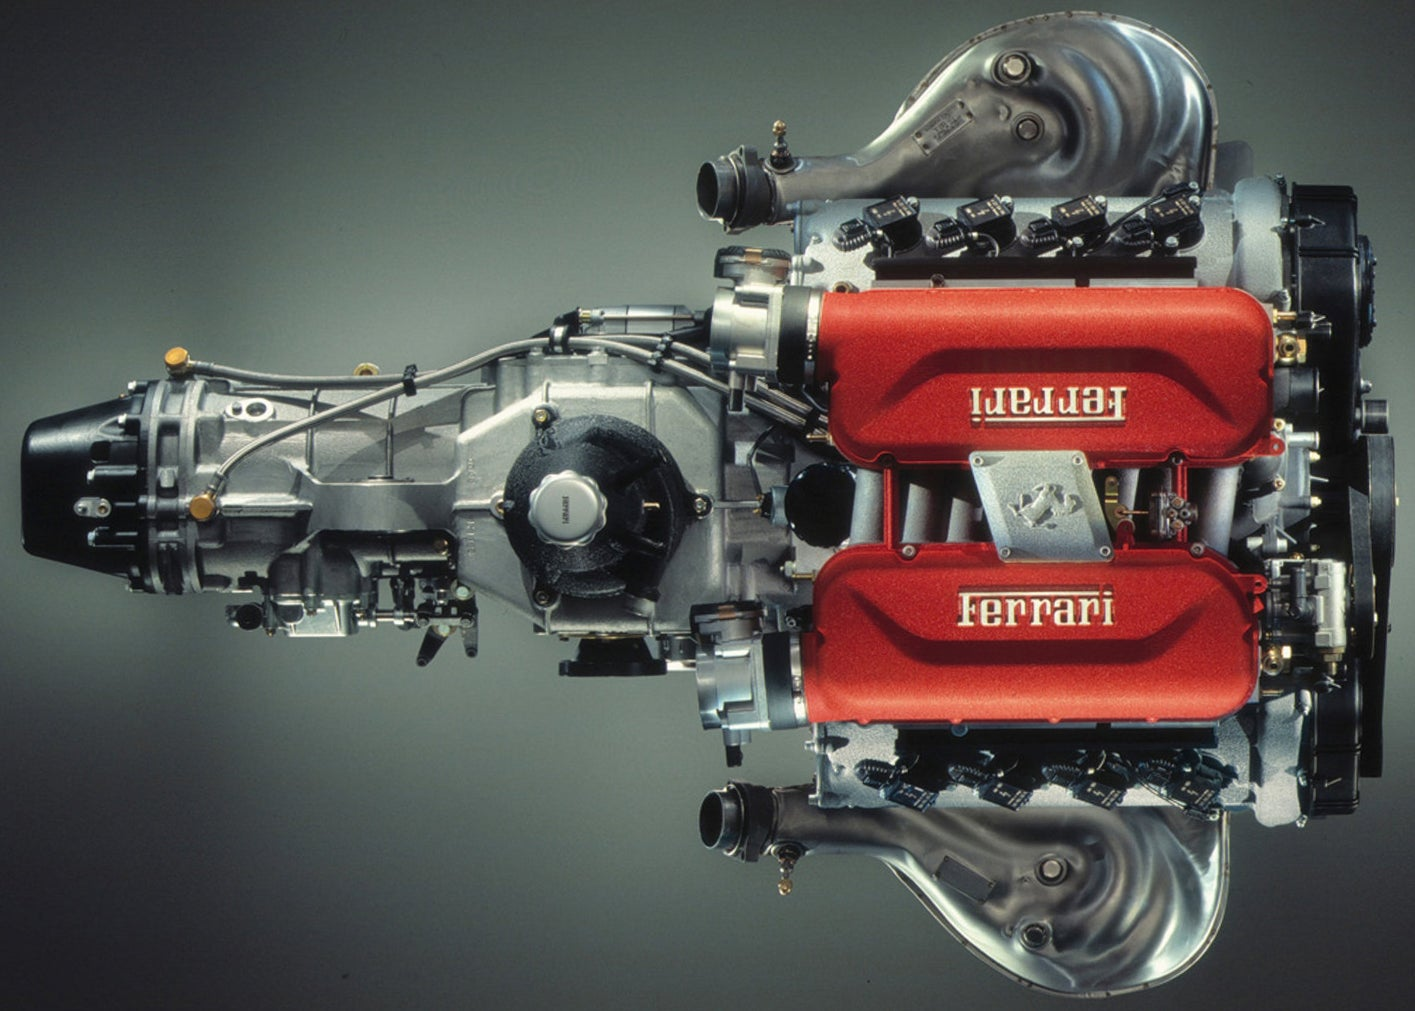 Ferrari's Website Is A Gold Mine Of Incredible Tech Photos